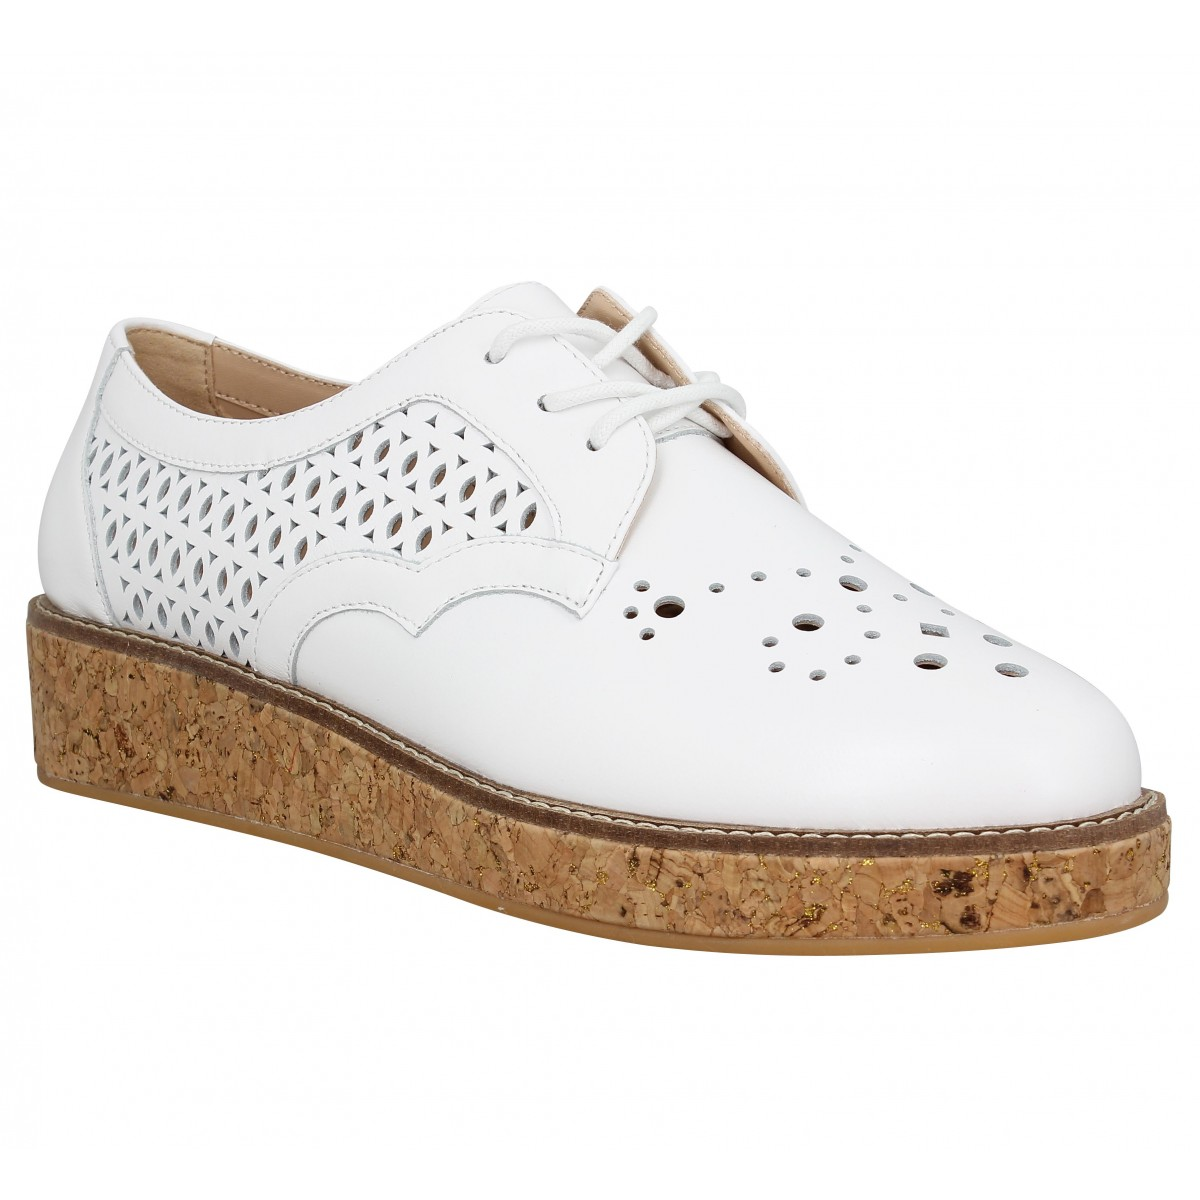 Chaussures à lacets SCHMOOVE Ariane Derby cuir Femme Blanc